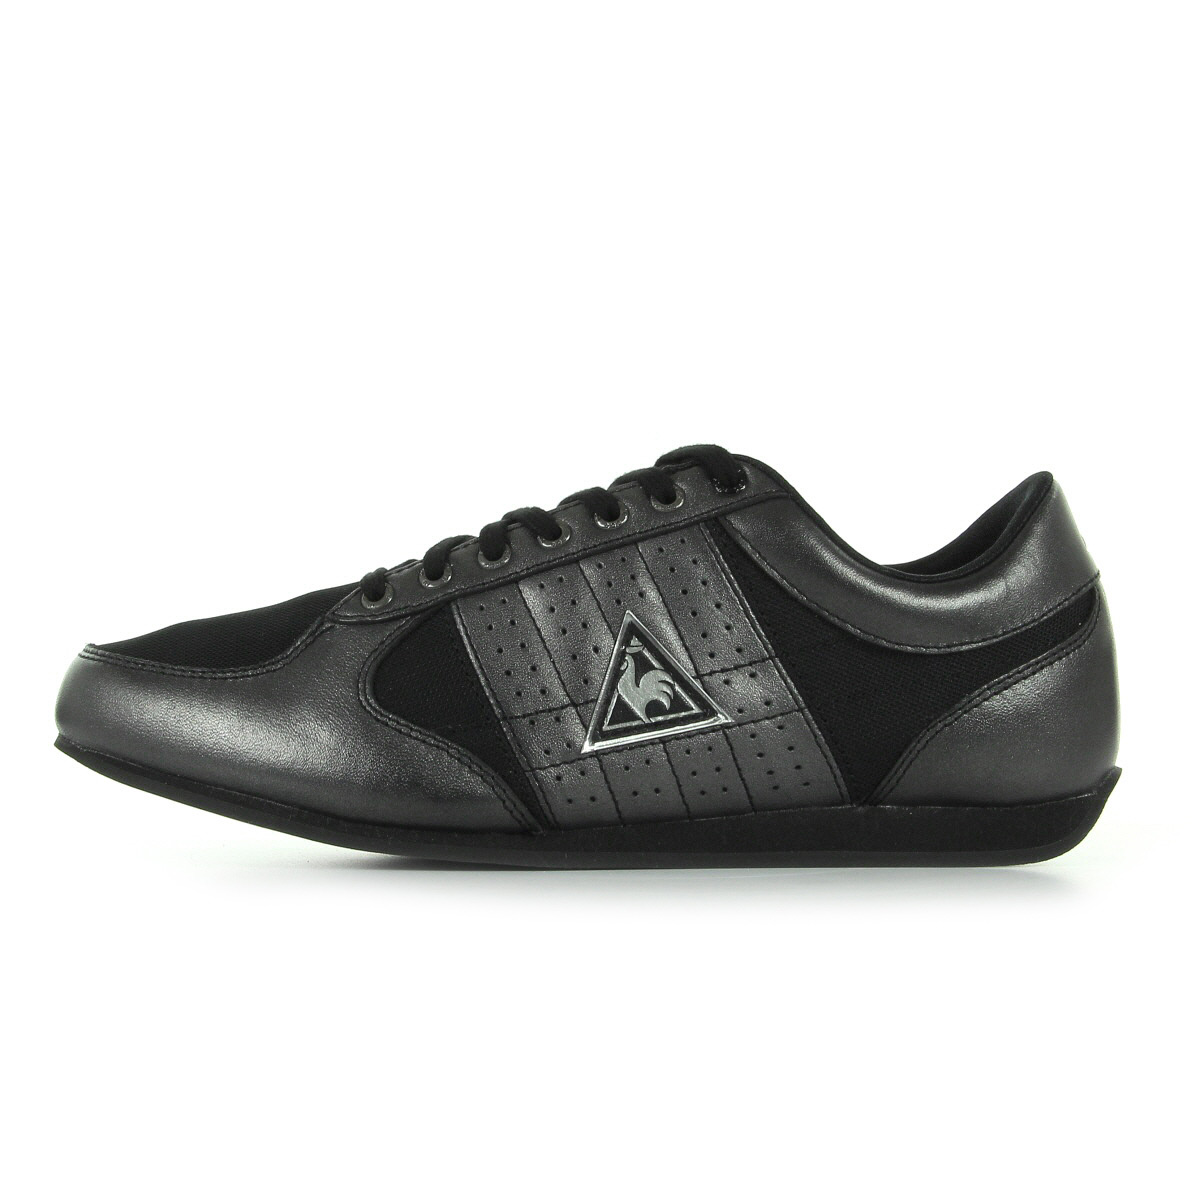 sneaker schuhe le coq sportif damen escrimilla 2 mesh schwarz leder ebay. Black Bedroom Furniture Sets. Home Design Ideas